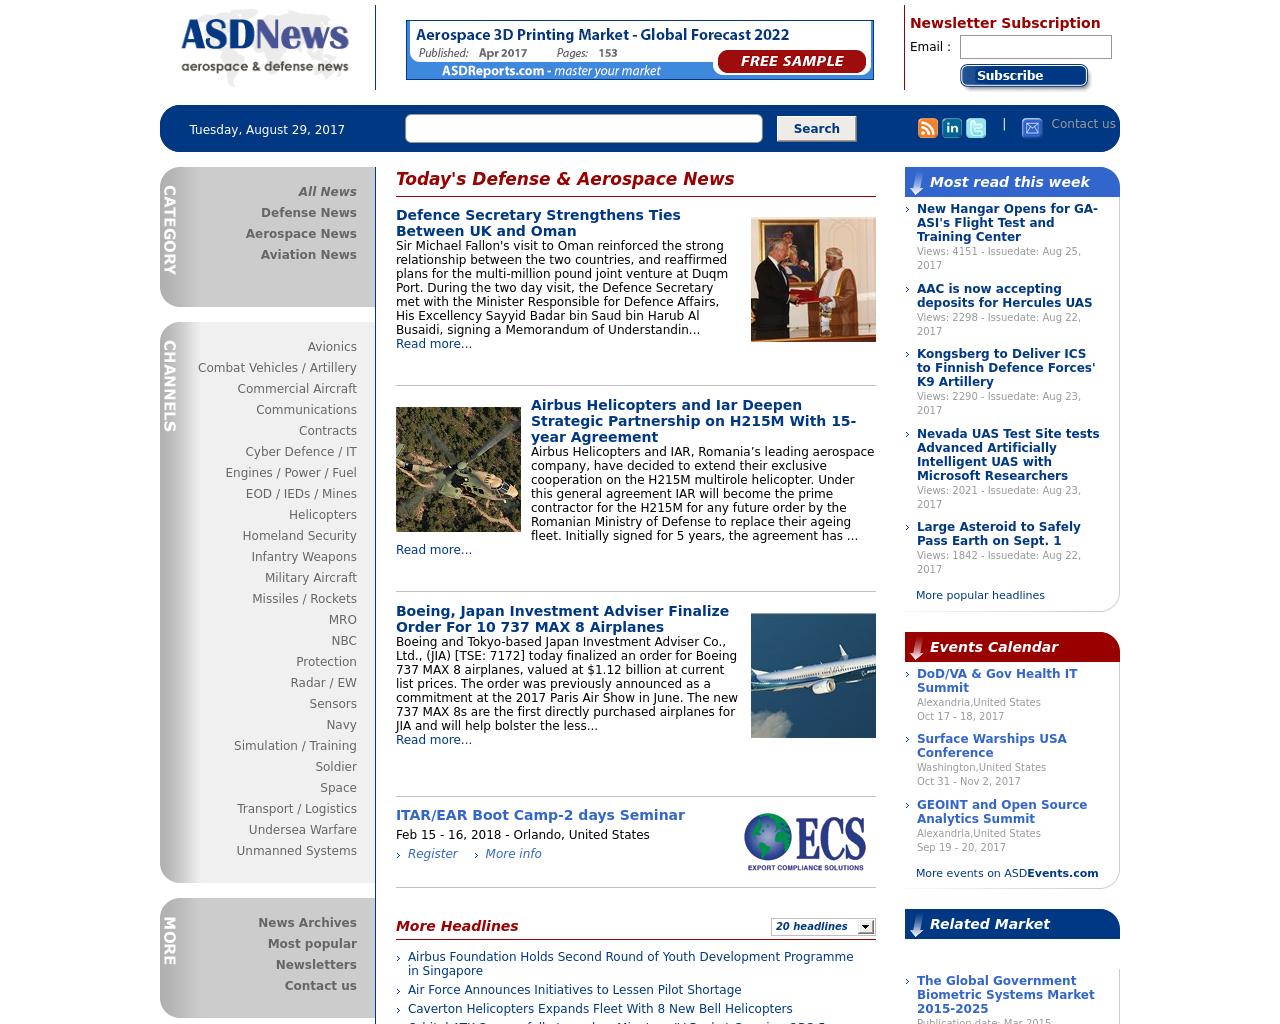 ASDNews-Advertising-Reviews-Pricing